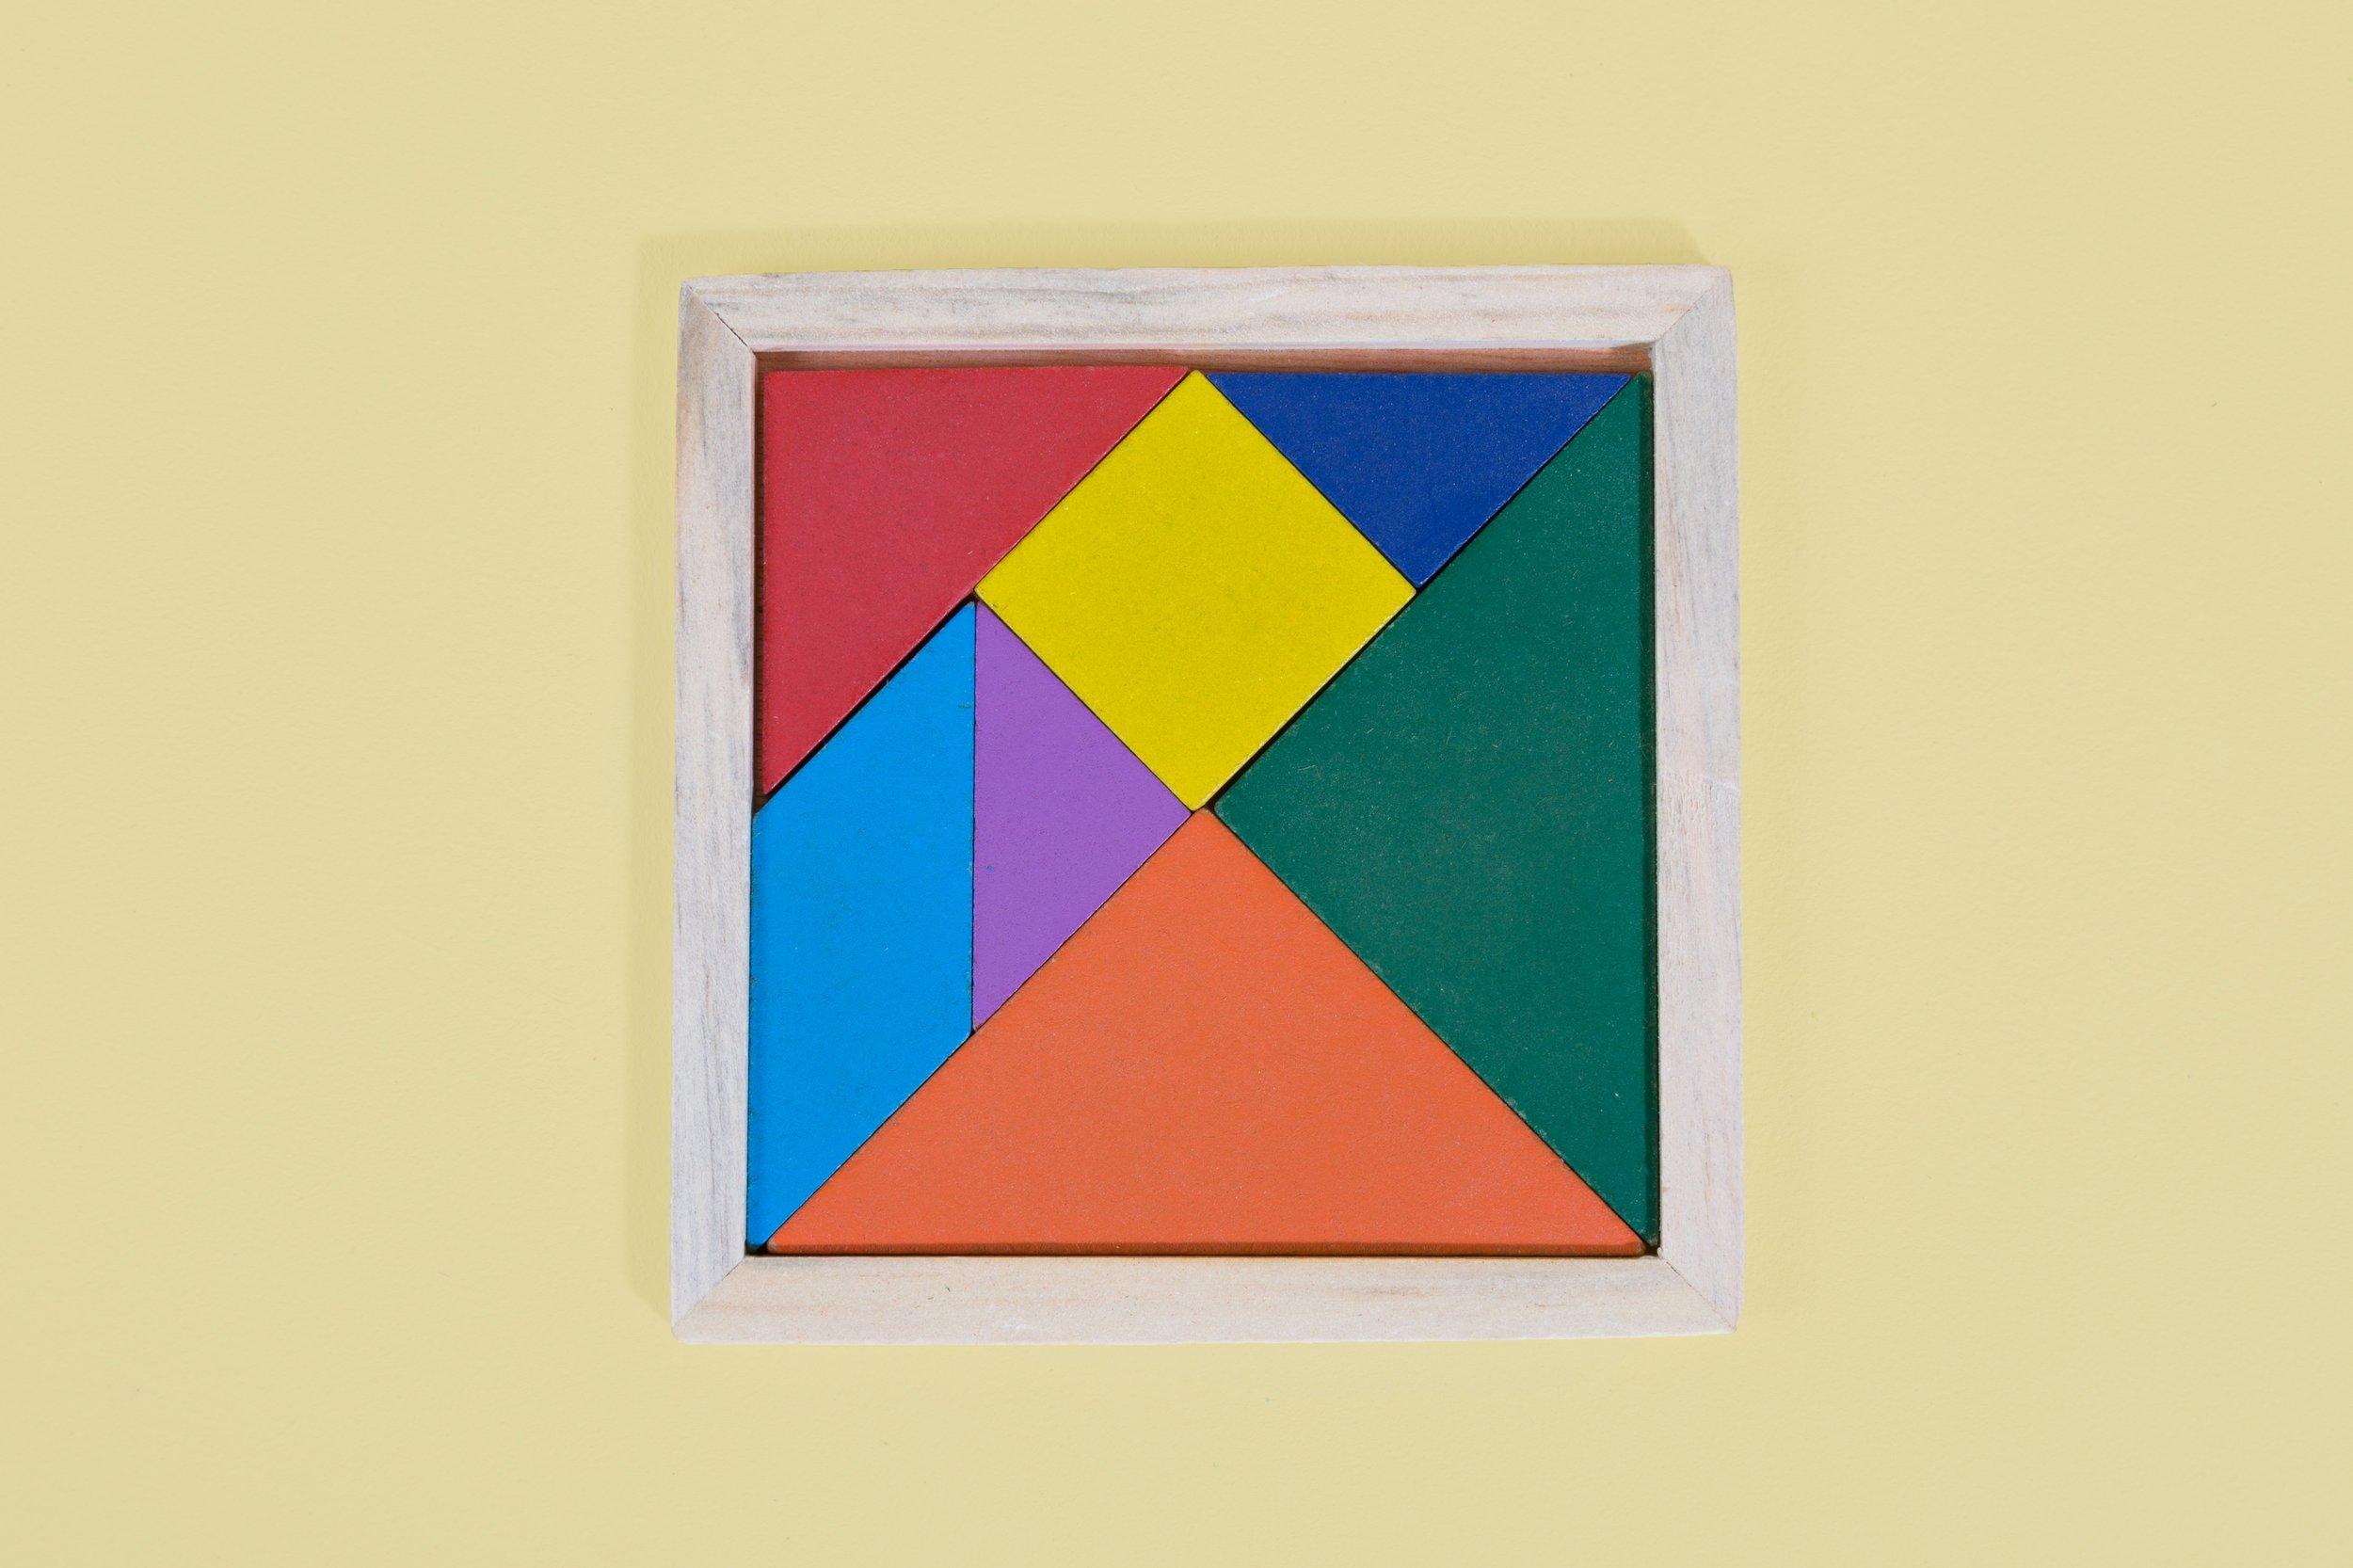 color-wood-puzzle.jpg